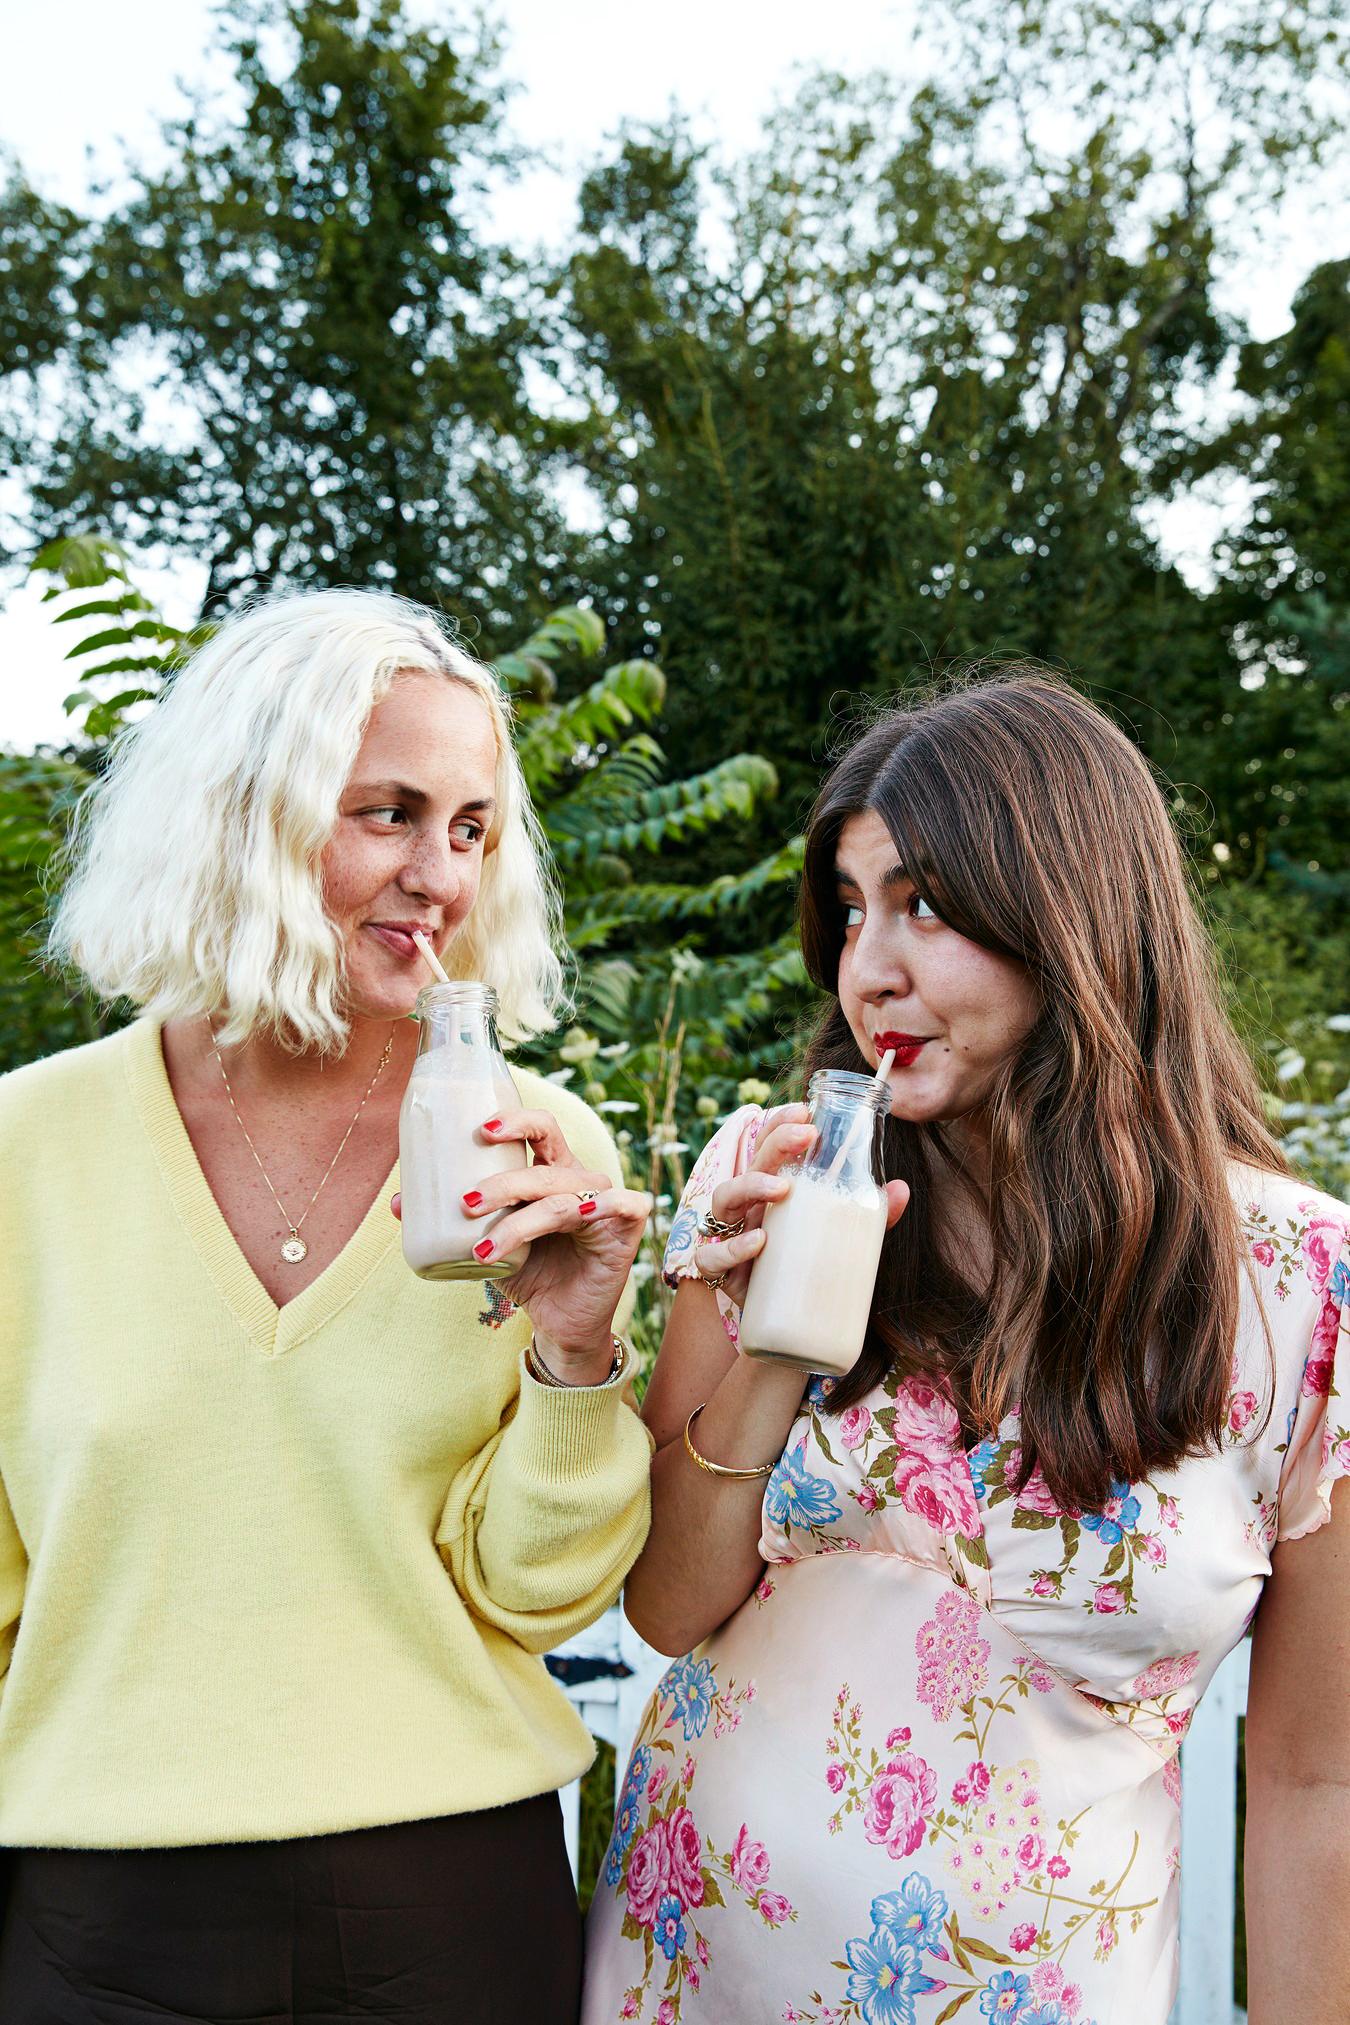 avril quy wedding new york milkshakes guests women